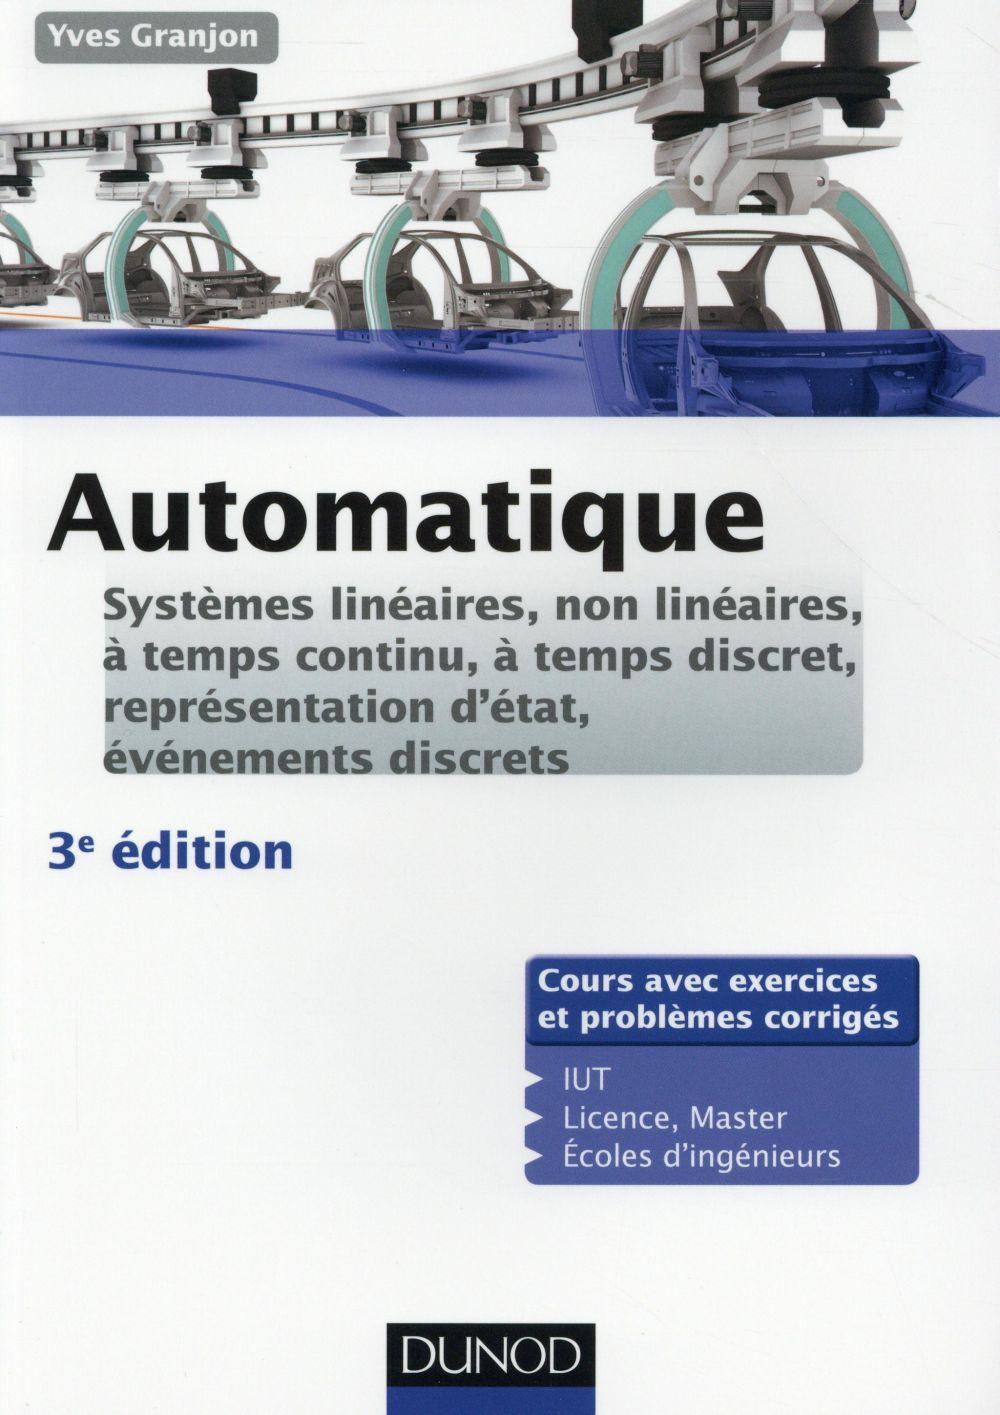 AUTOMATIQUE - 3ED -SYSTEMES LINEAIRES, NON LINEAIRES, A TEMPS CONTINU, A TEMPS DISCRET...